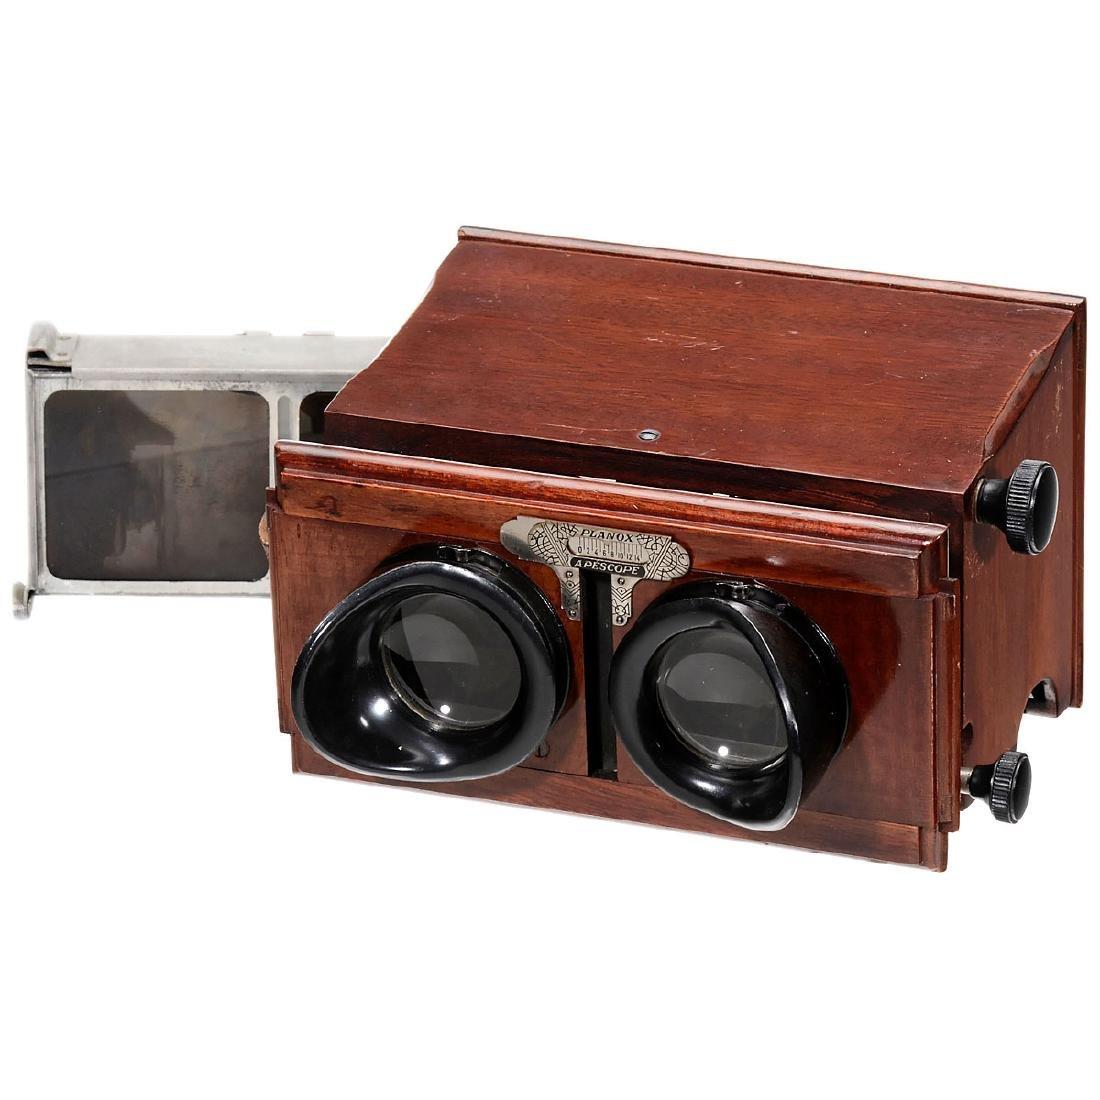 Planox Apescope 6 x 13, c. 1925